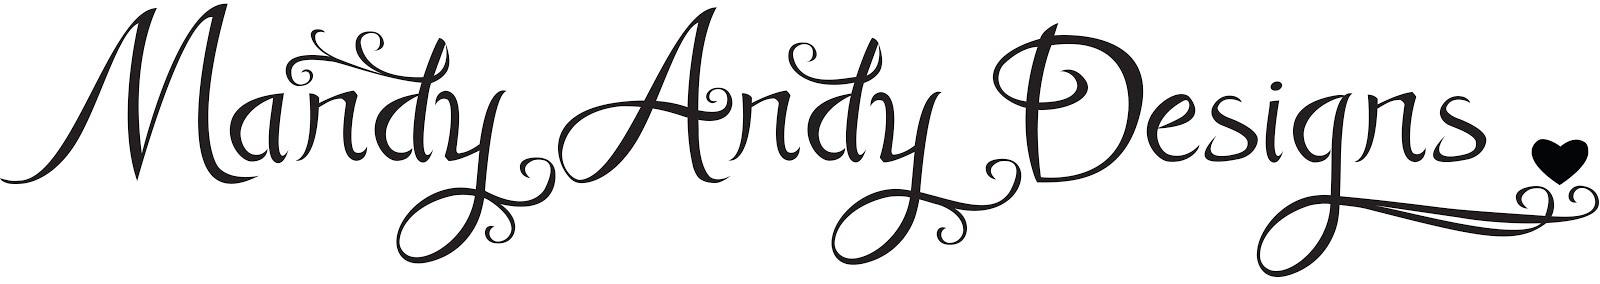 Mandy Andy Designs